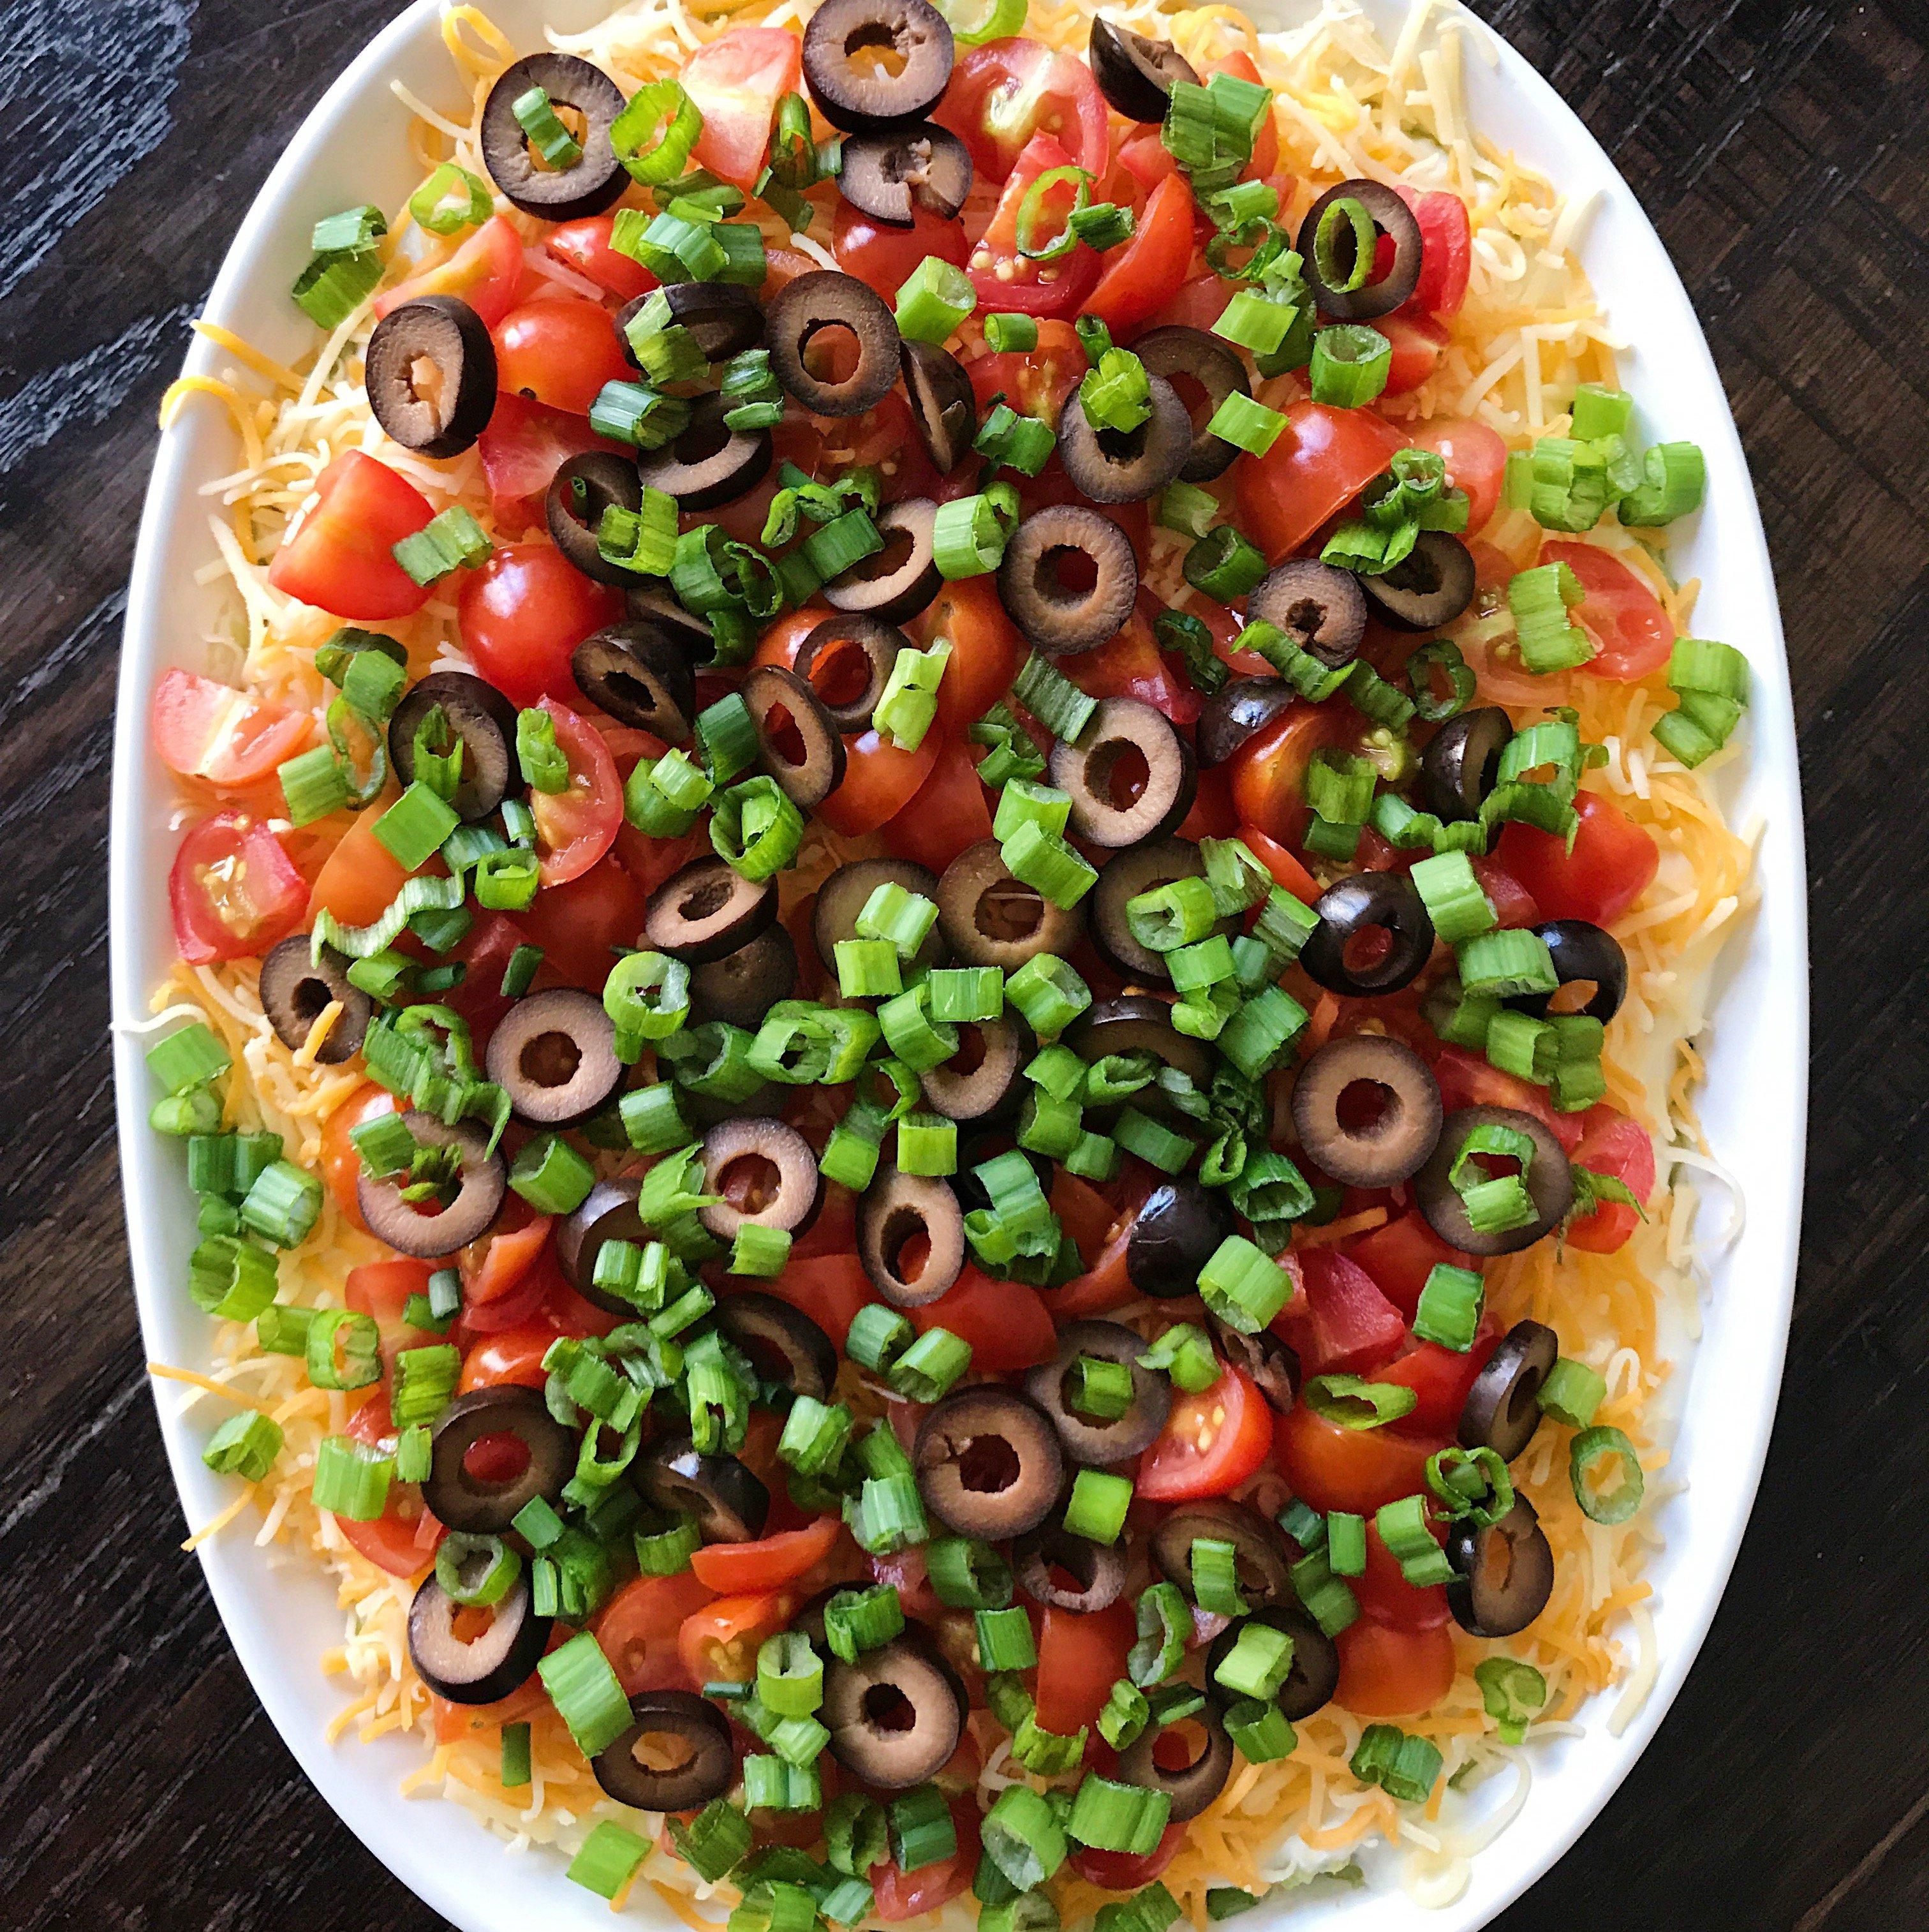 Mexican 7 layer dip gluten free #glutenfreerecipes www.healthygffamily.com